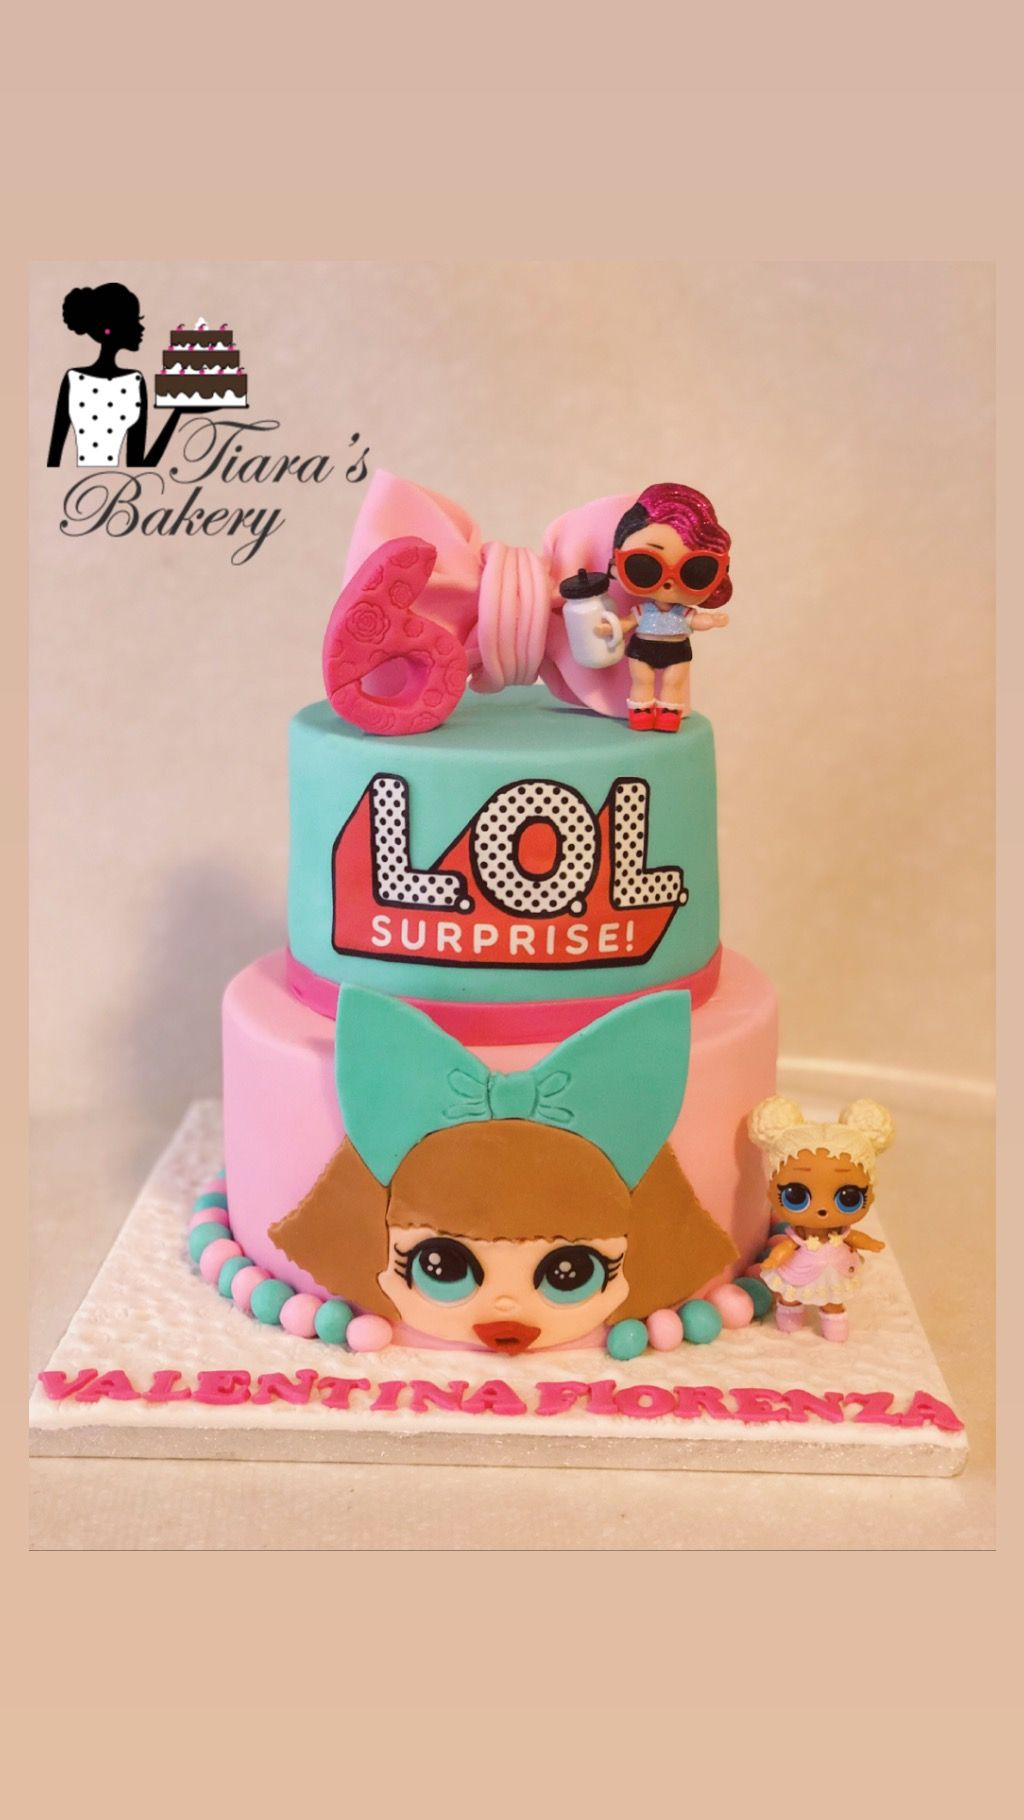 Lol Doll Cake L O L Cake Lol Cake Lol Torte Girly Cake Cake For Girls Cute Cake Funny Birthday Cakes Lol Doll Cake Birthday Cake Decorating